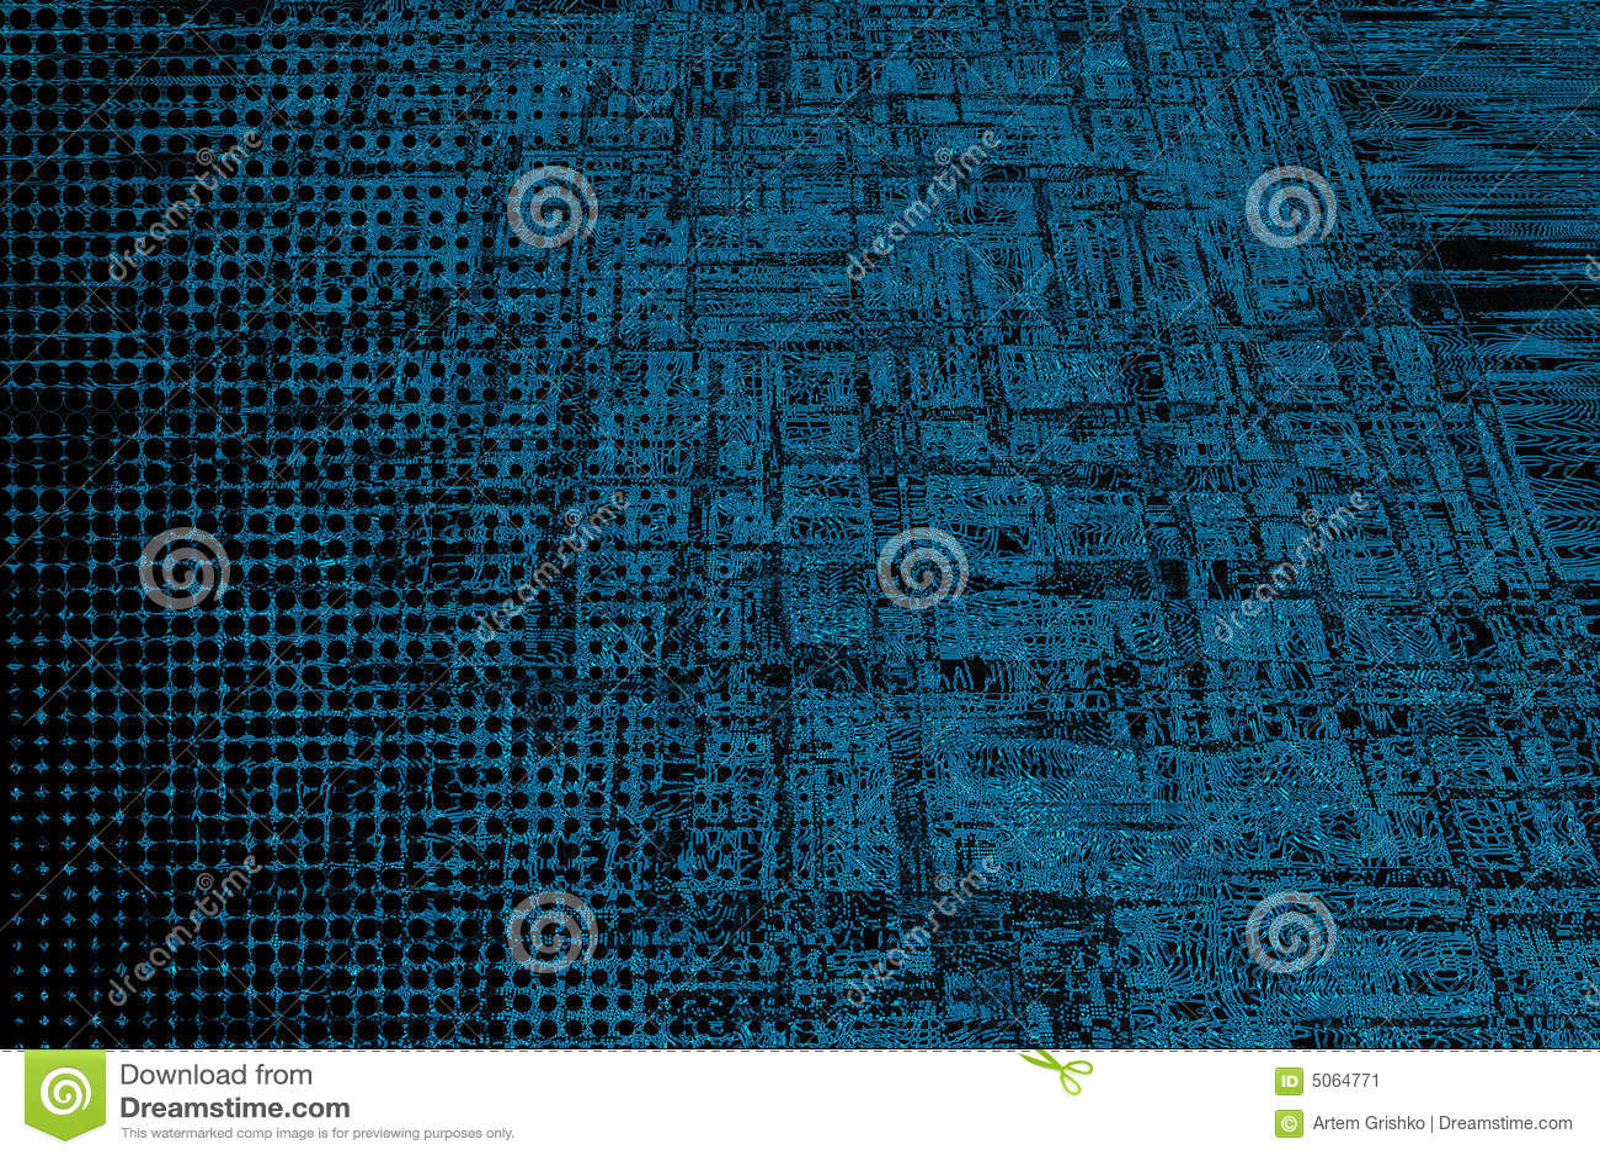 Circuitry Background By Onetooneandonto On Deviantart Eydt I Download